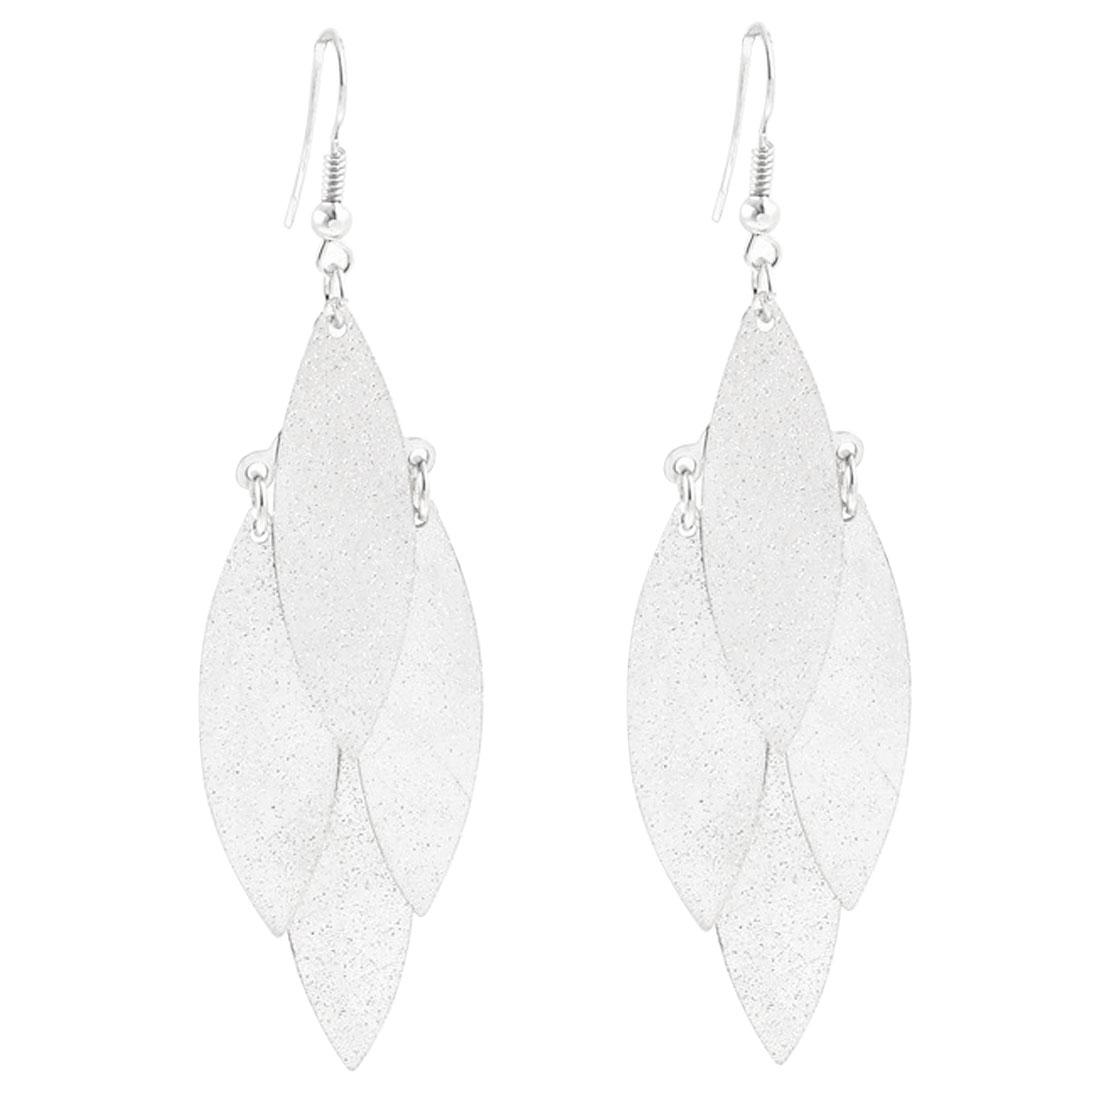 Leave Shape Pendant Hanging Fish Hook Earrings Eardrop Pair Silver Tone